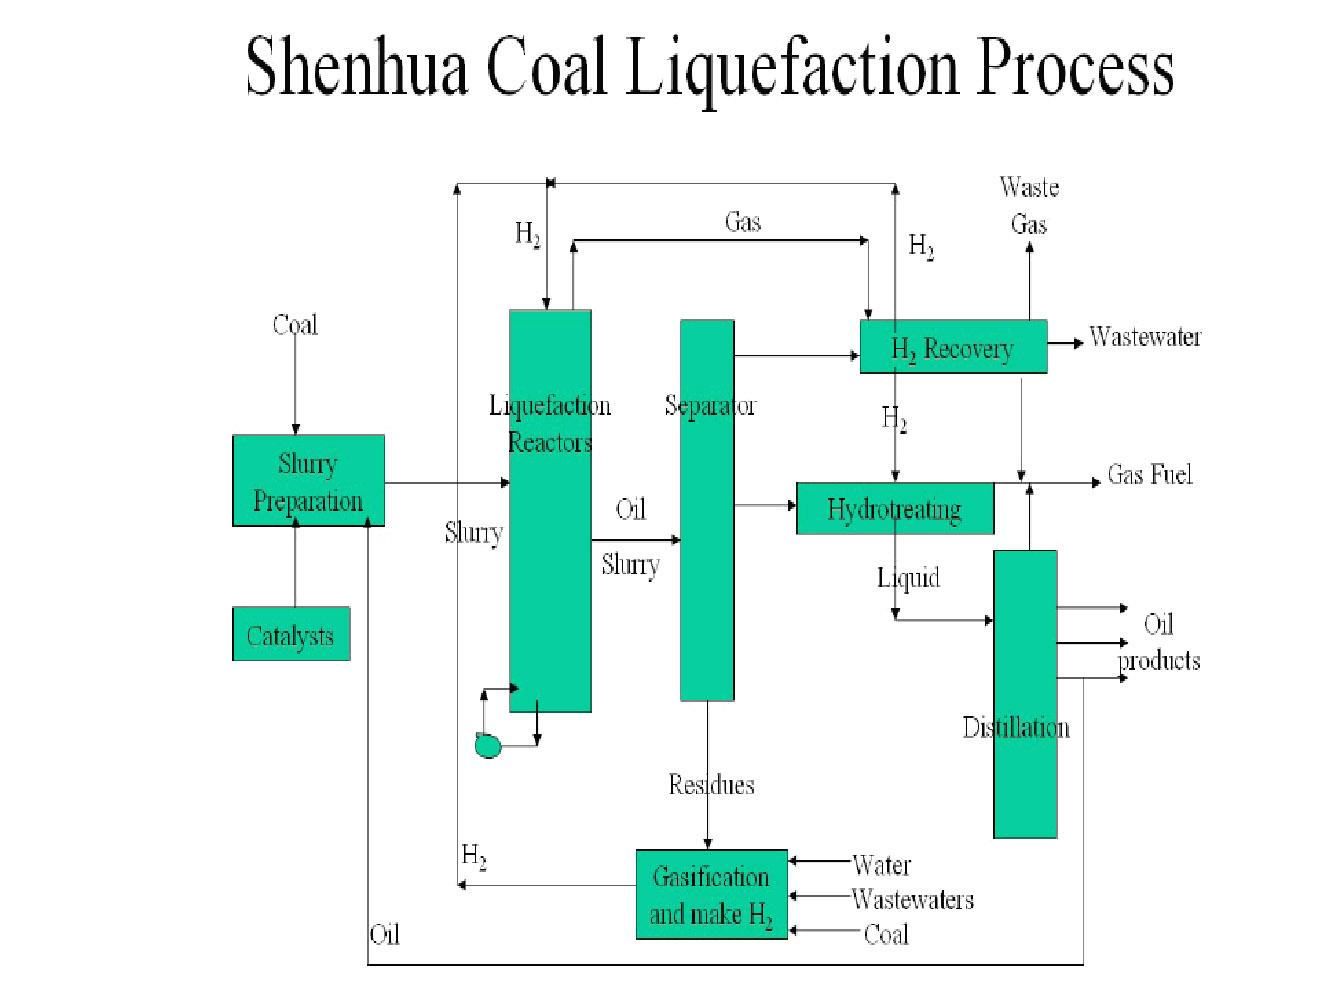 Al fin energy june 2012 shenhua direct coal liquefaction plant pooptronica Image collections